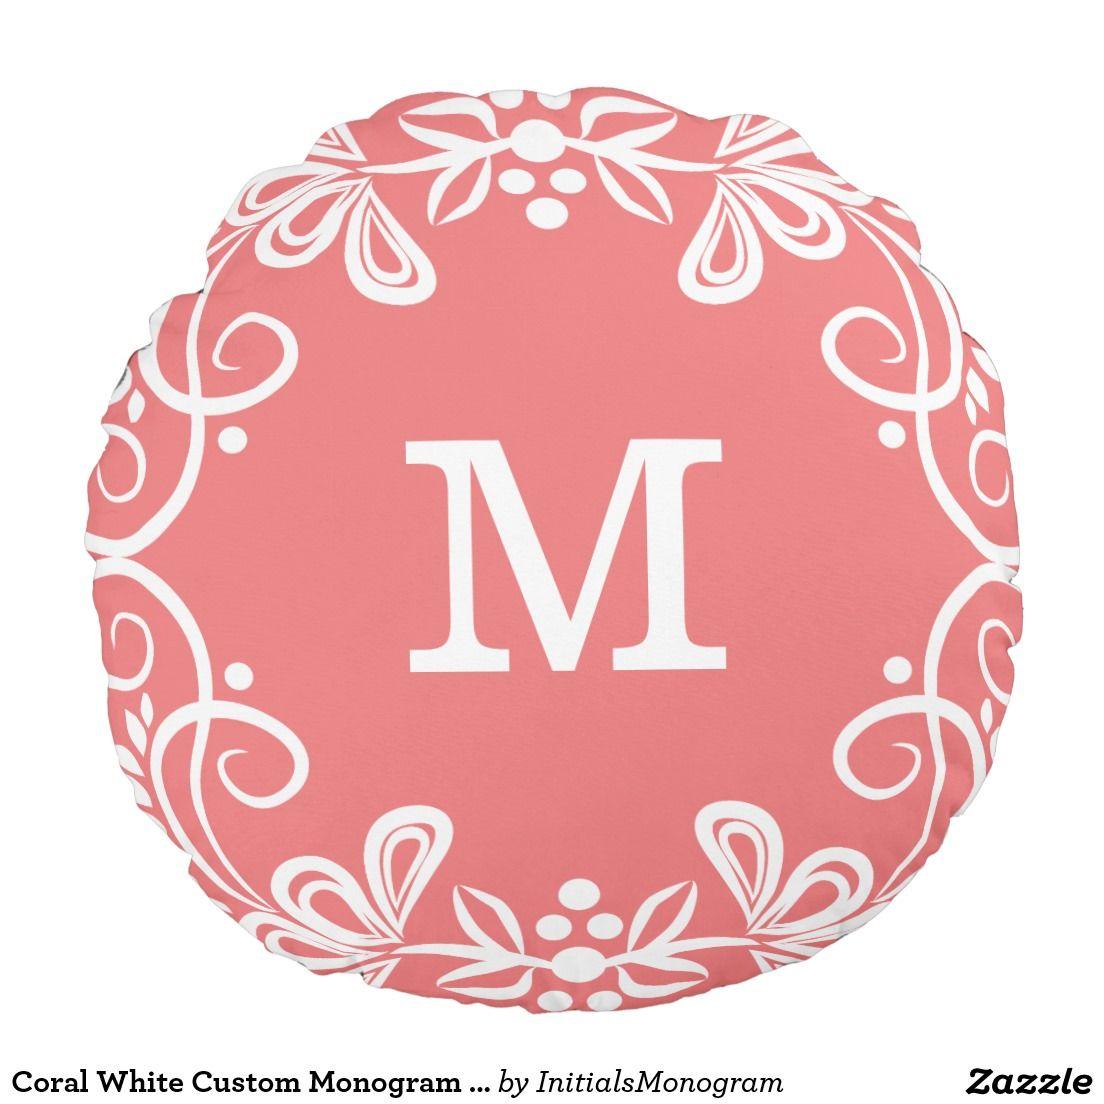 Coral White Custom Monogram Decorative Round Pillow